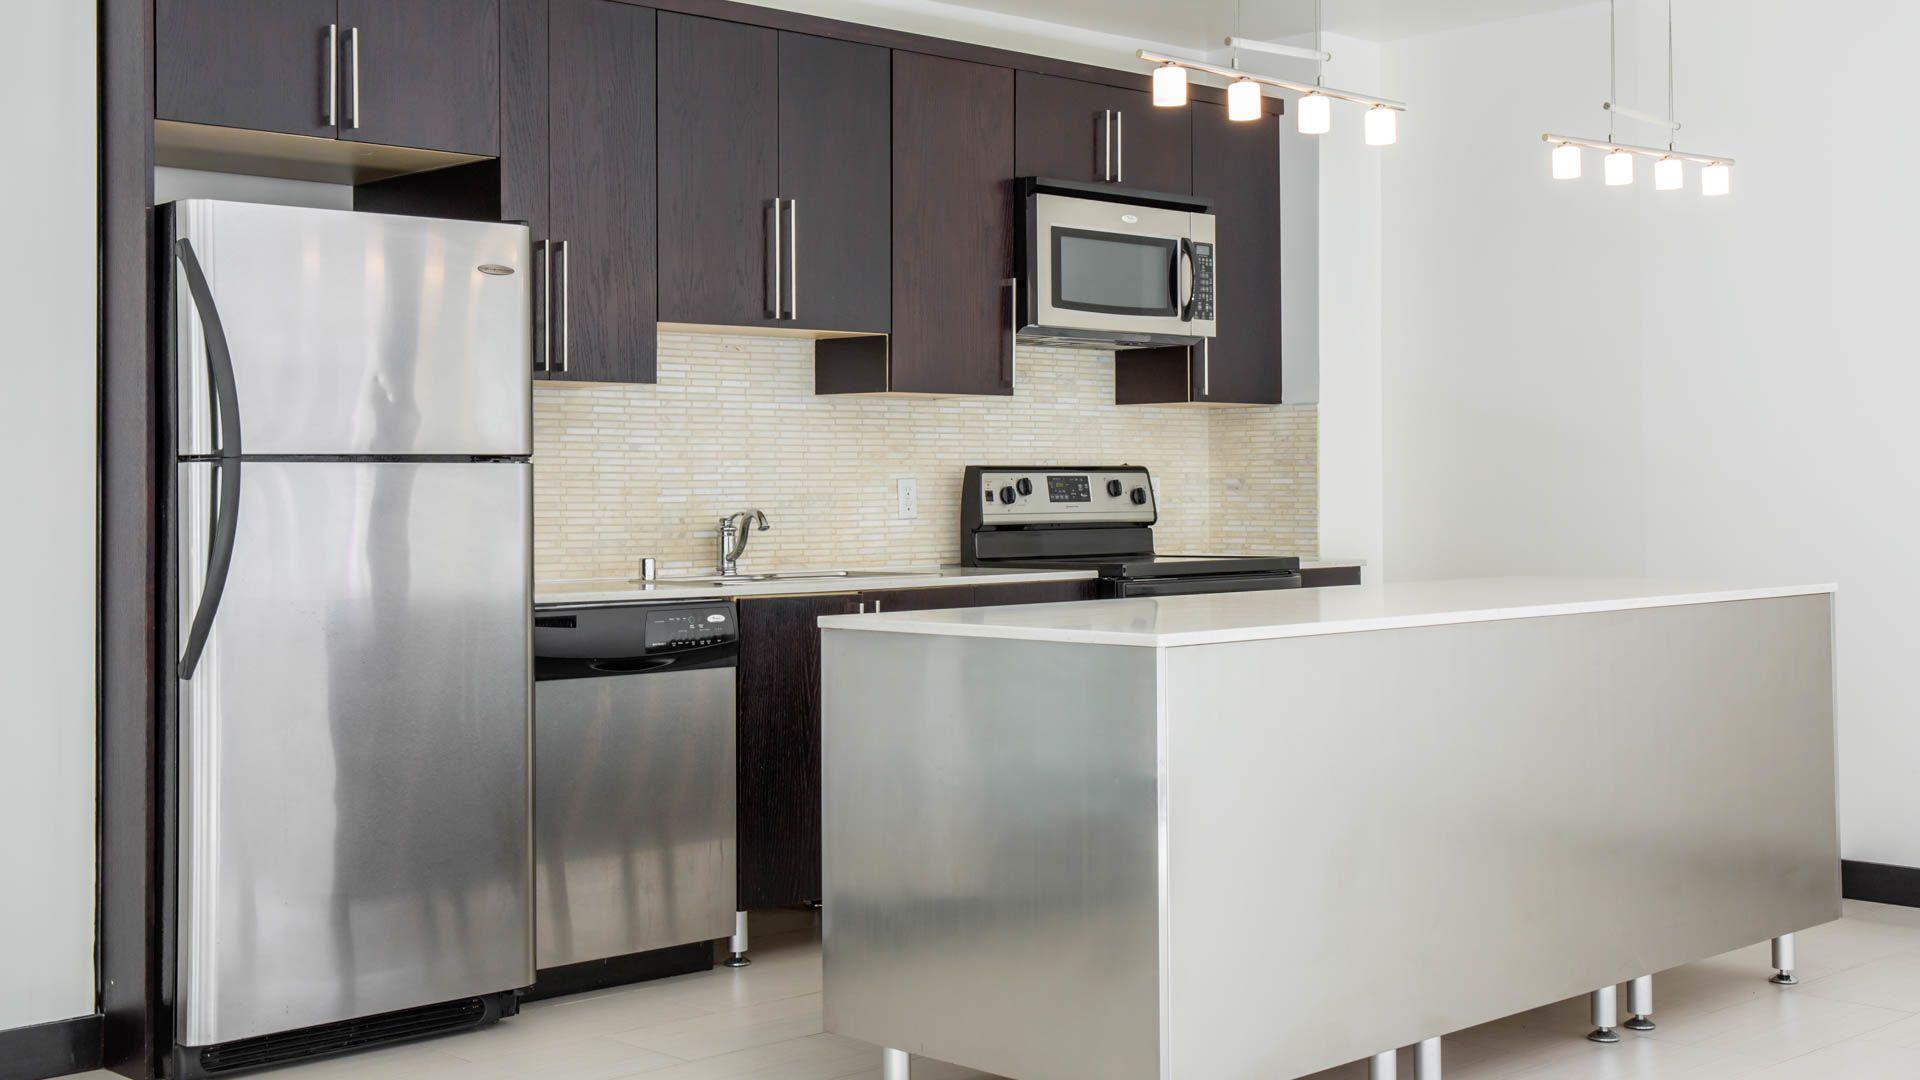 Milano Lofts Apartments - Kitchen